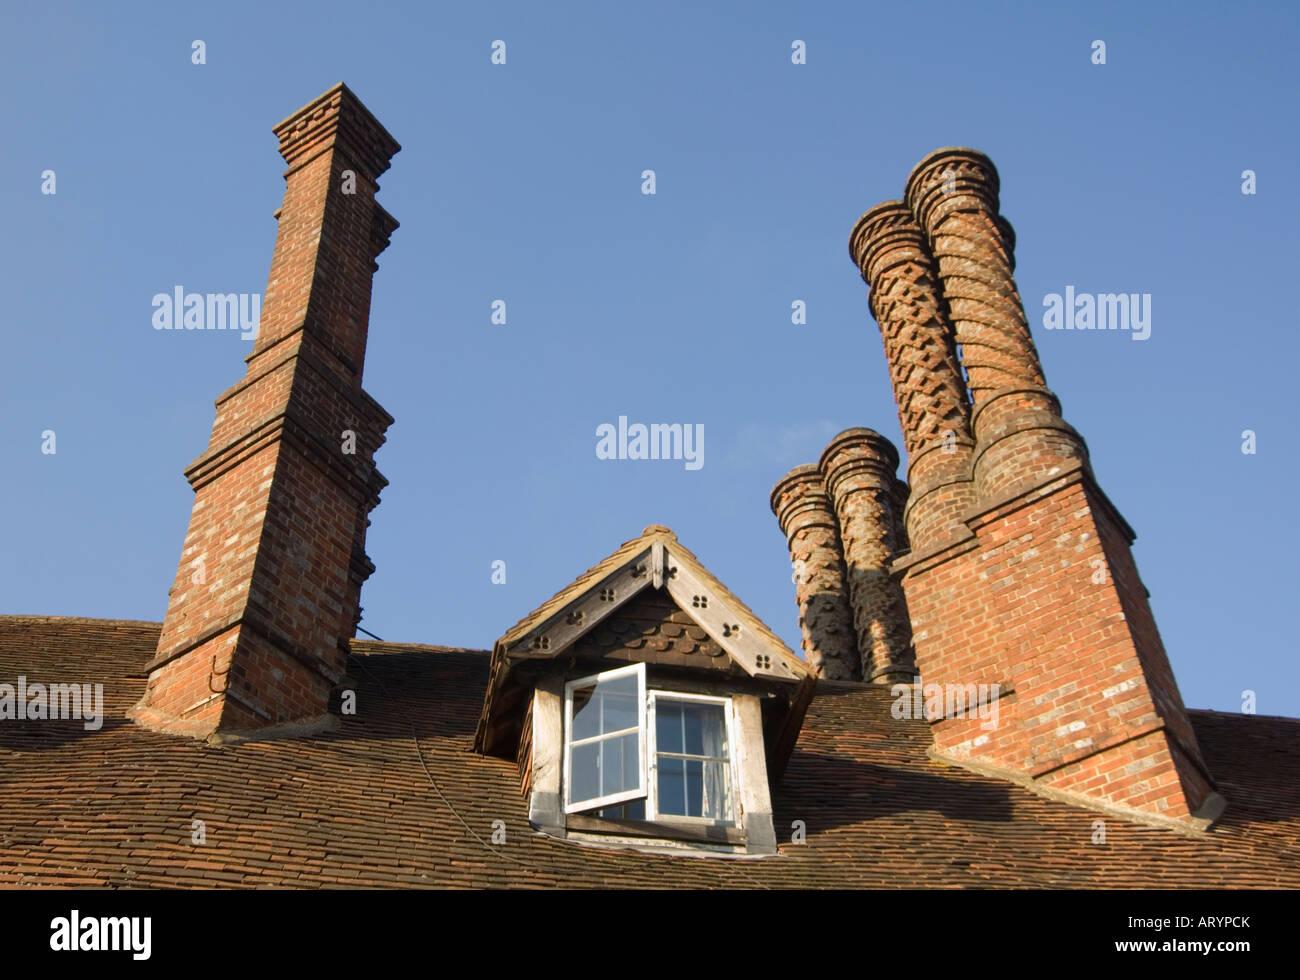 Tudor Chimney Pots Albury Surrey UK - Stock Image